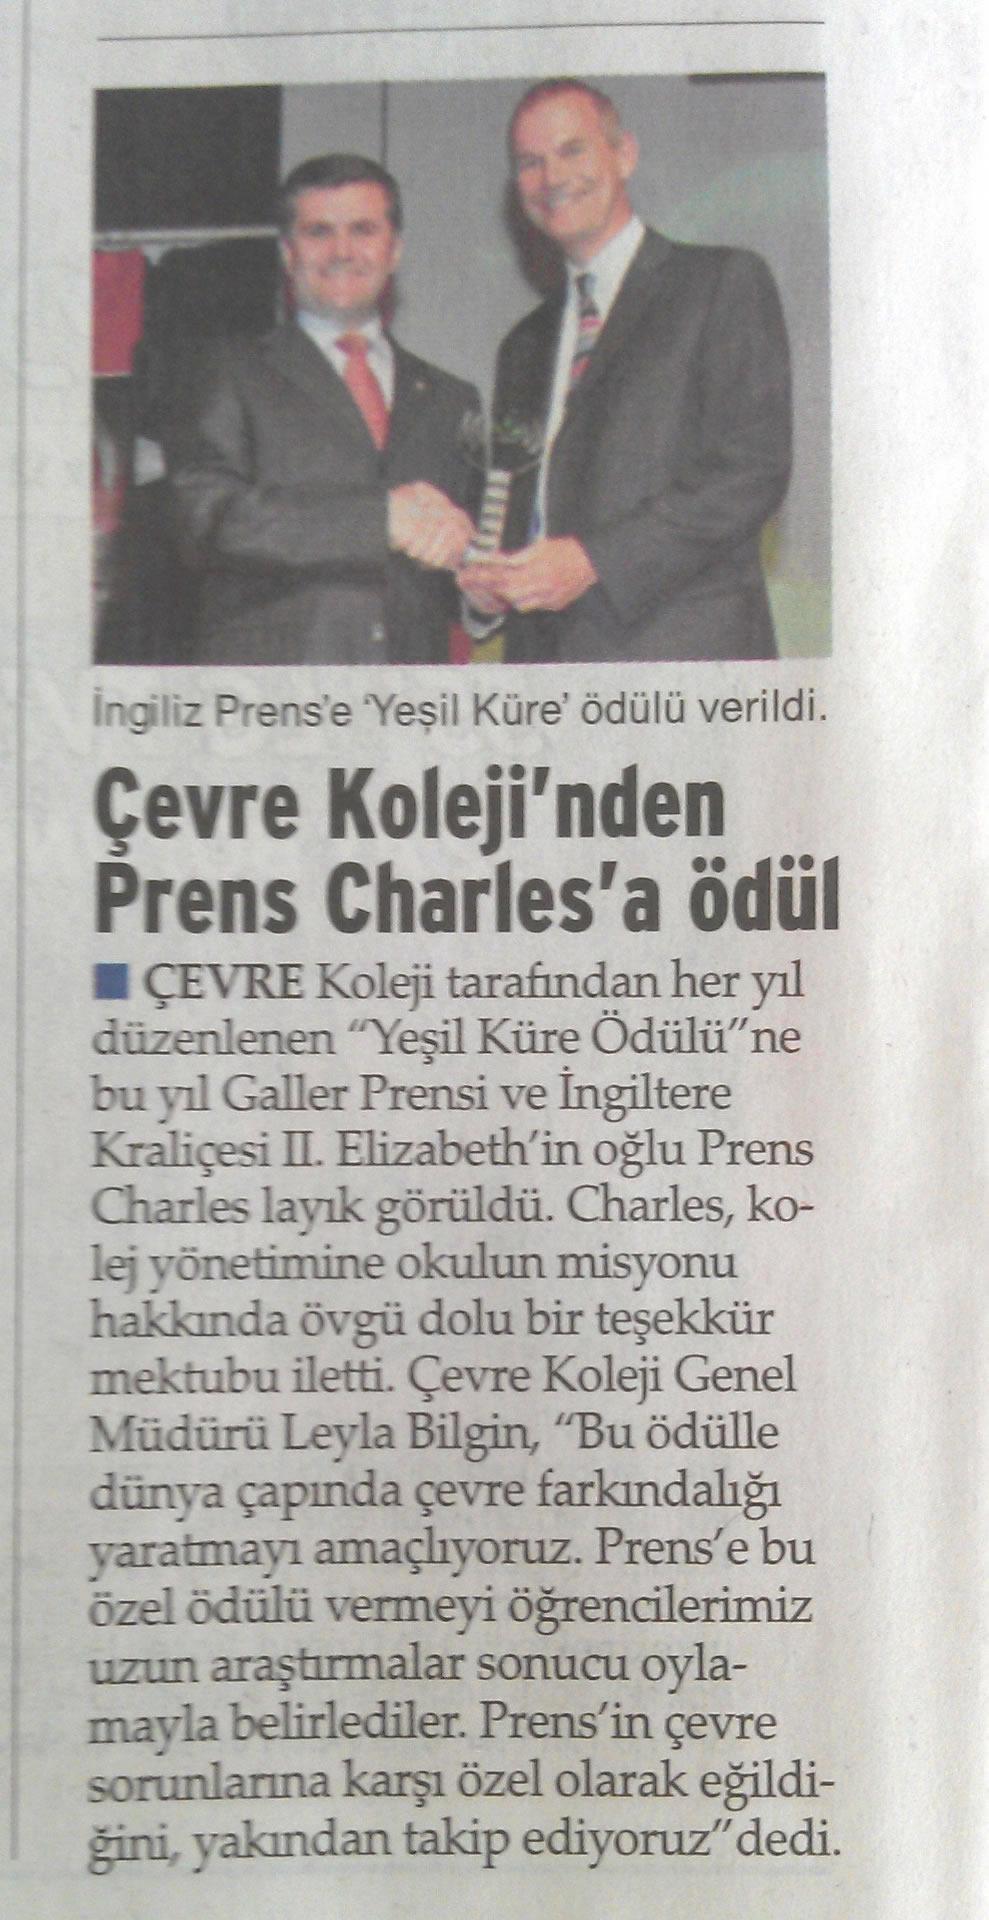 Çevre Koleji'nden Prens Charles'a ödül